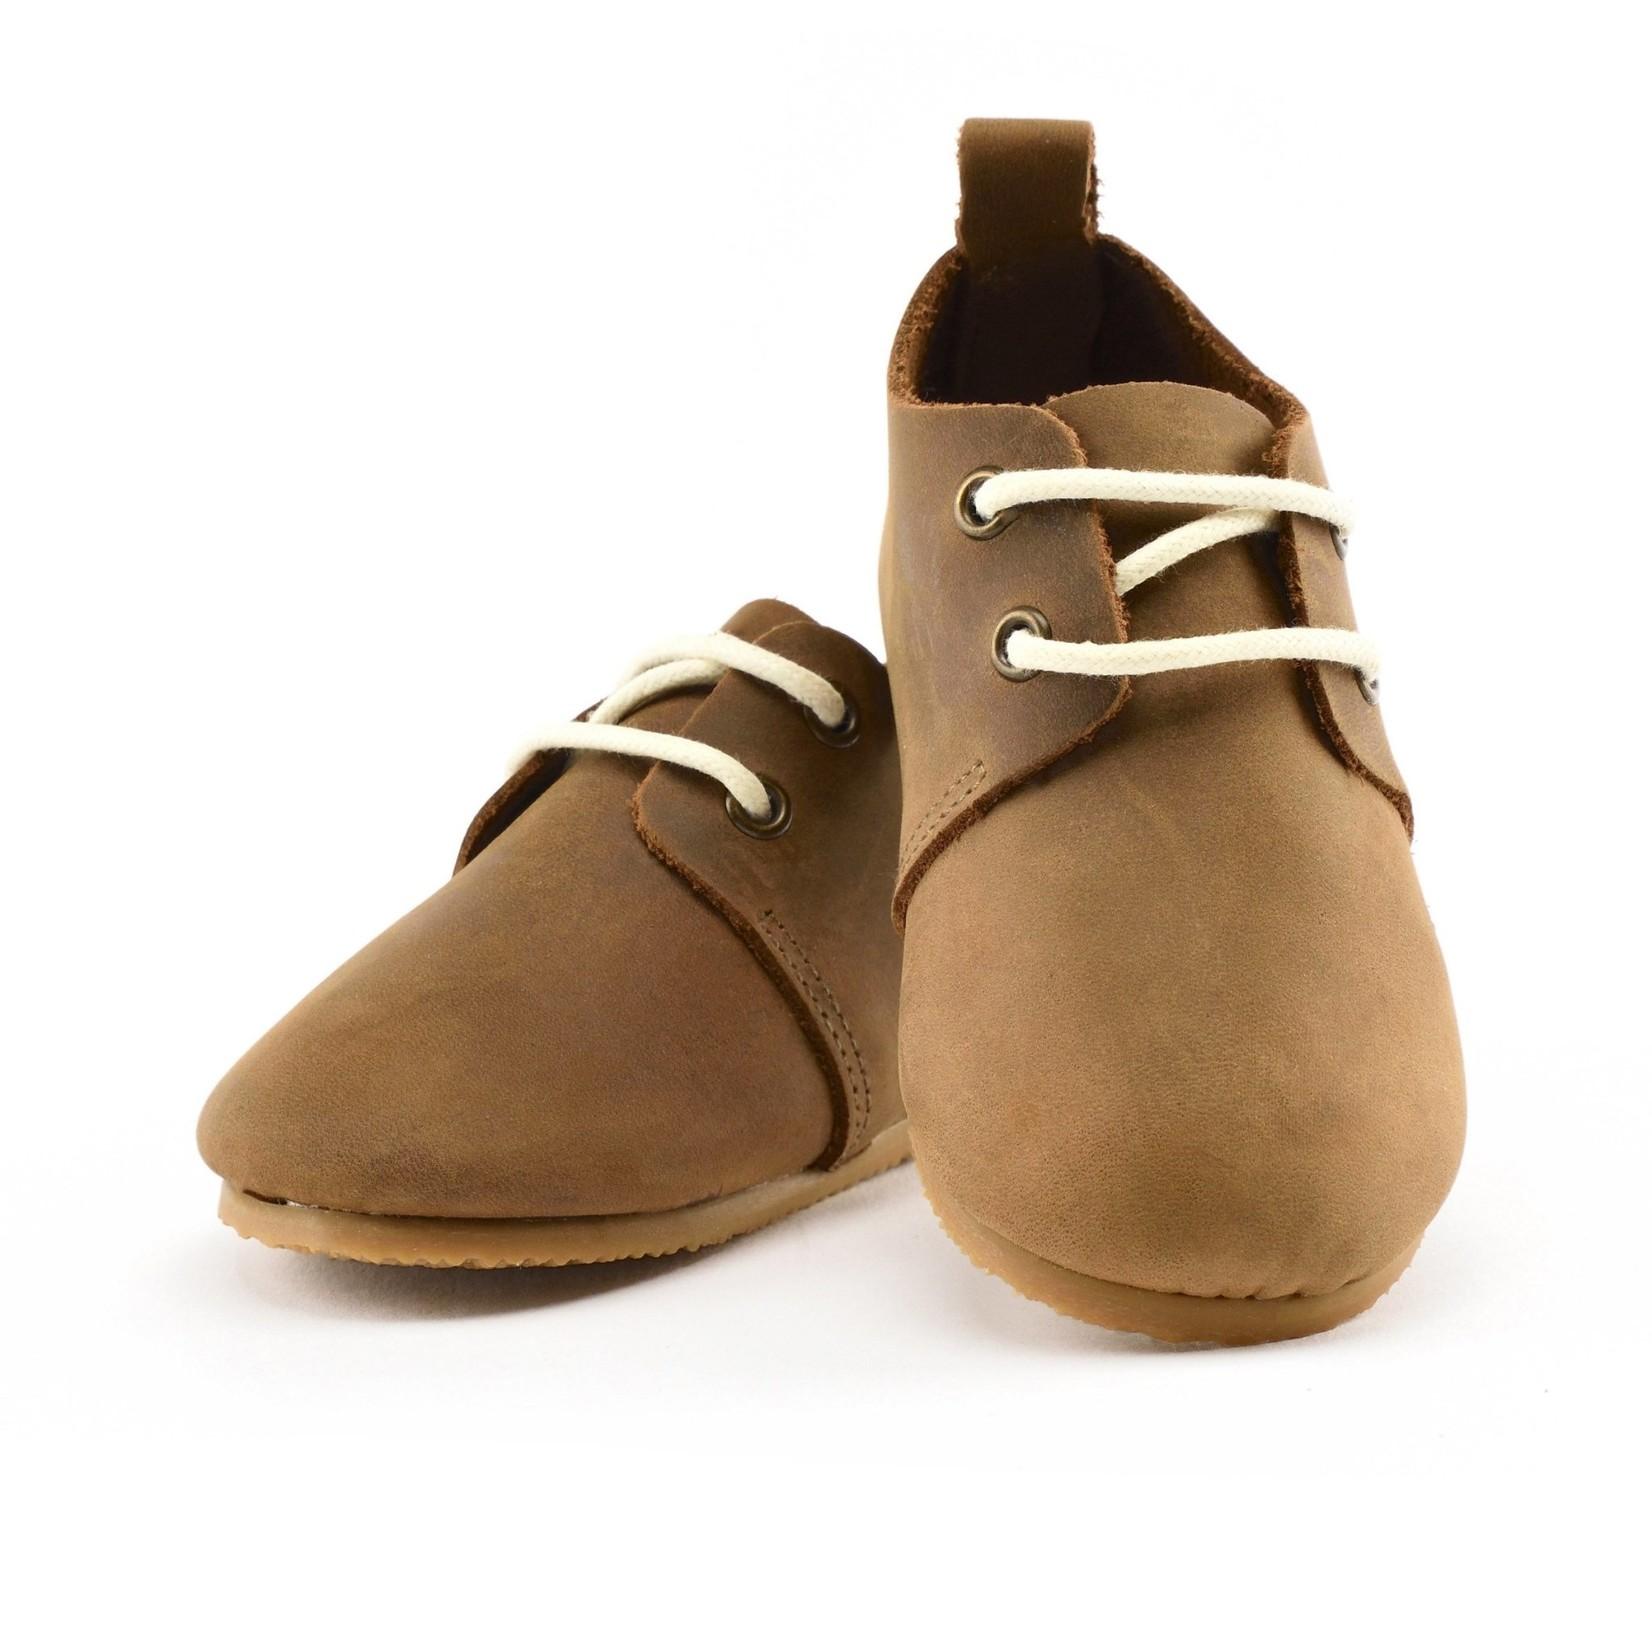 Premium Leather Oxfords - Brown - Hard Sole